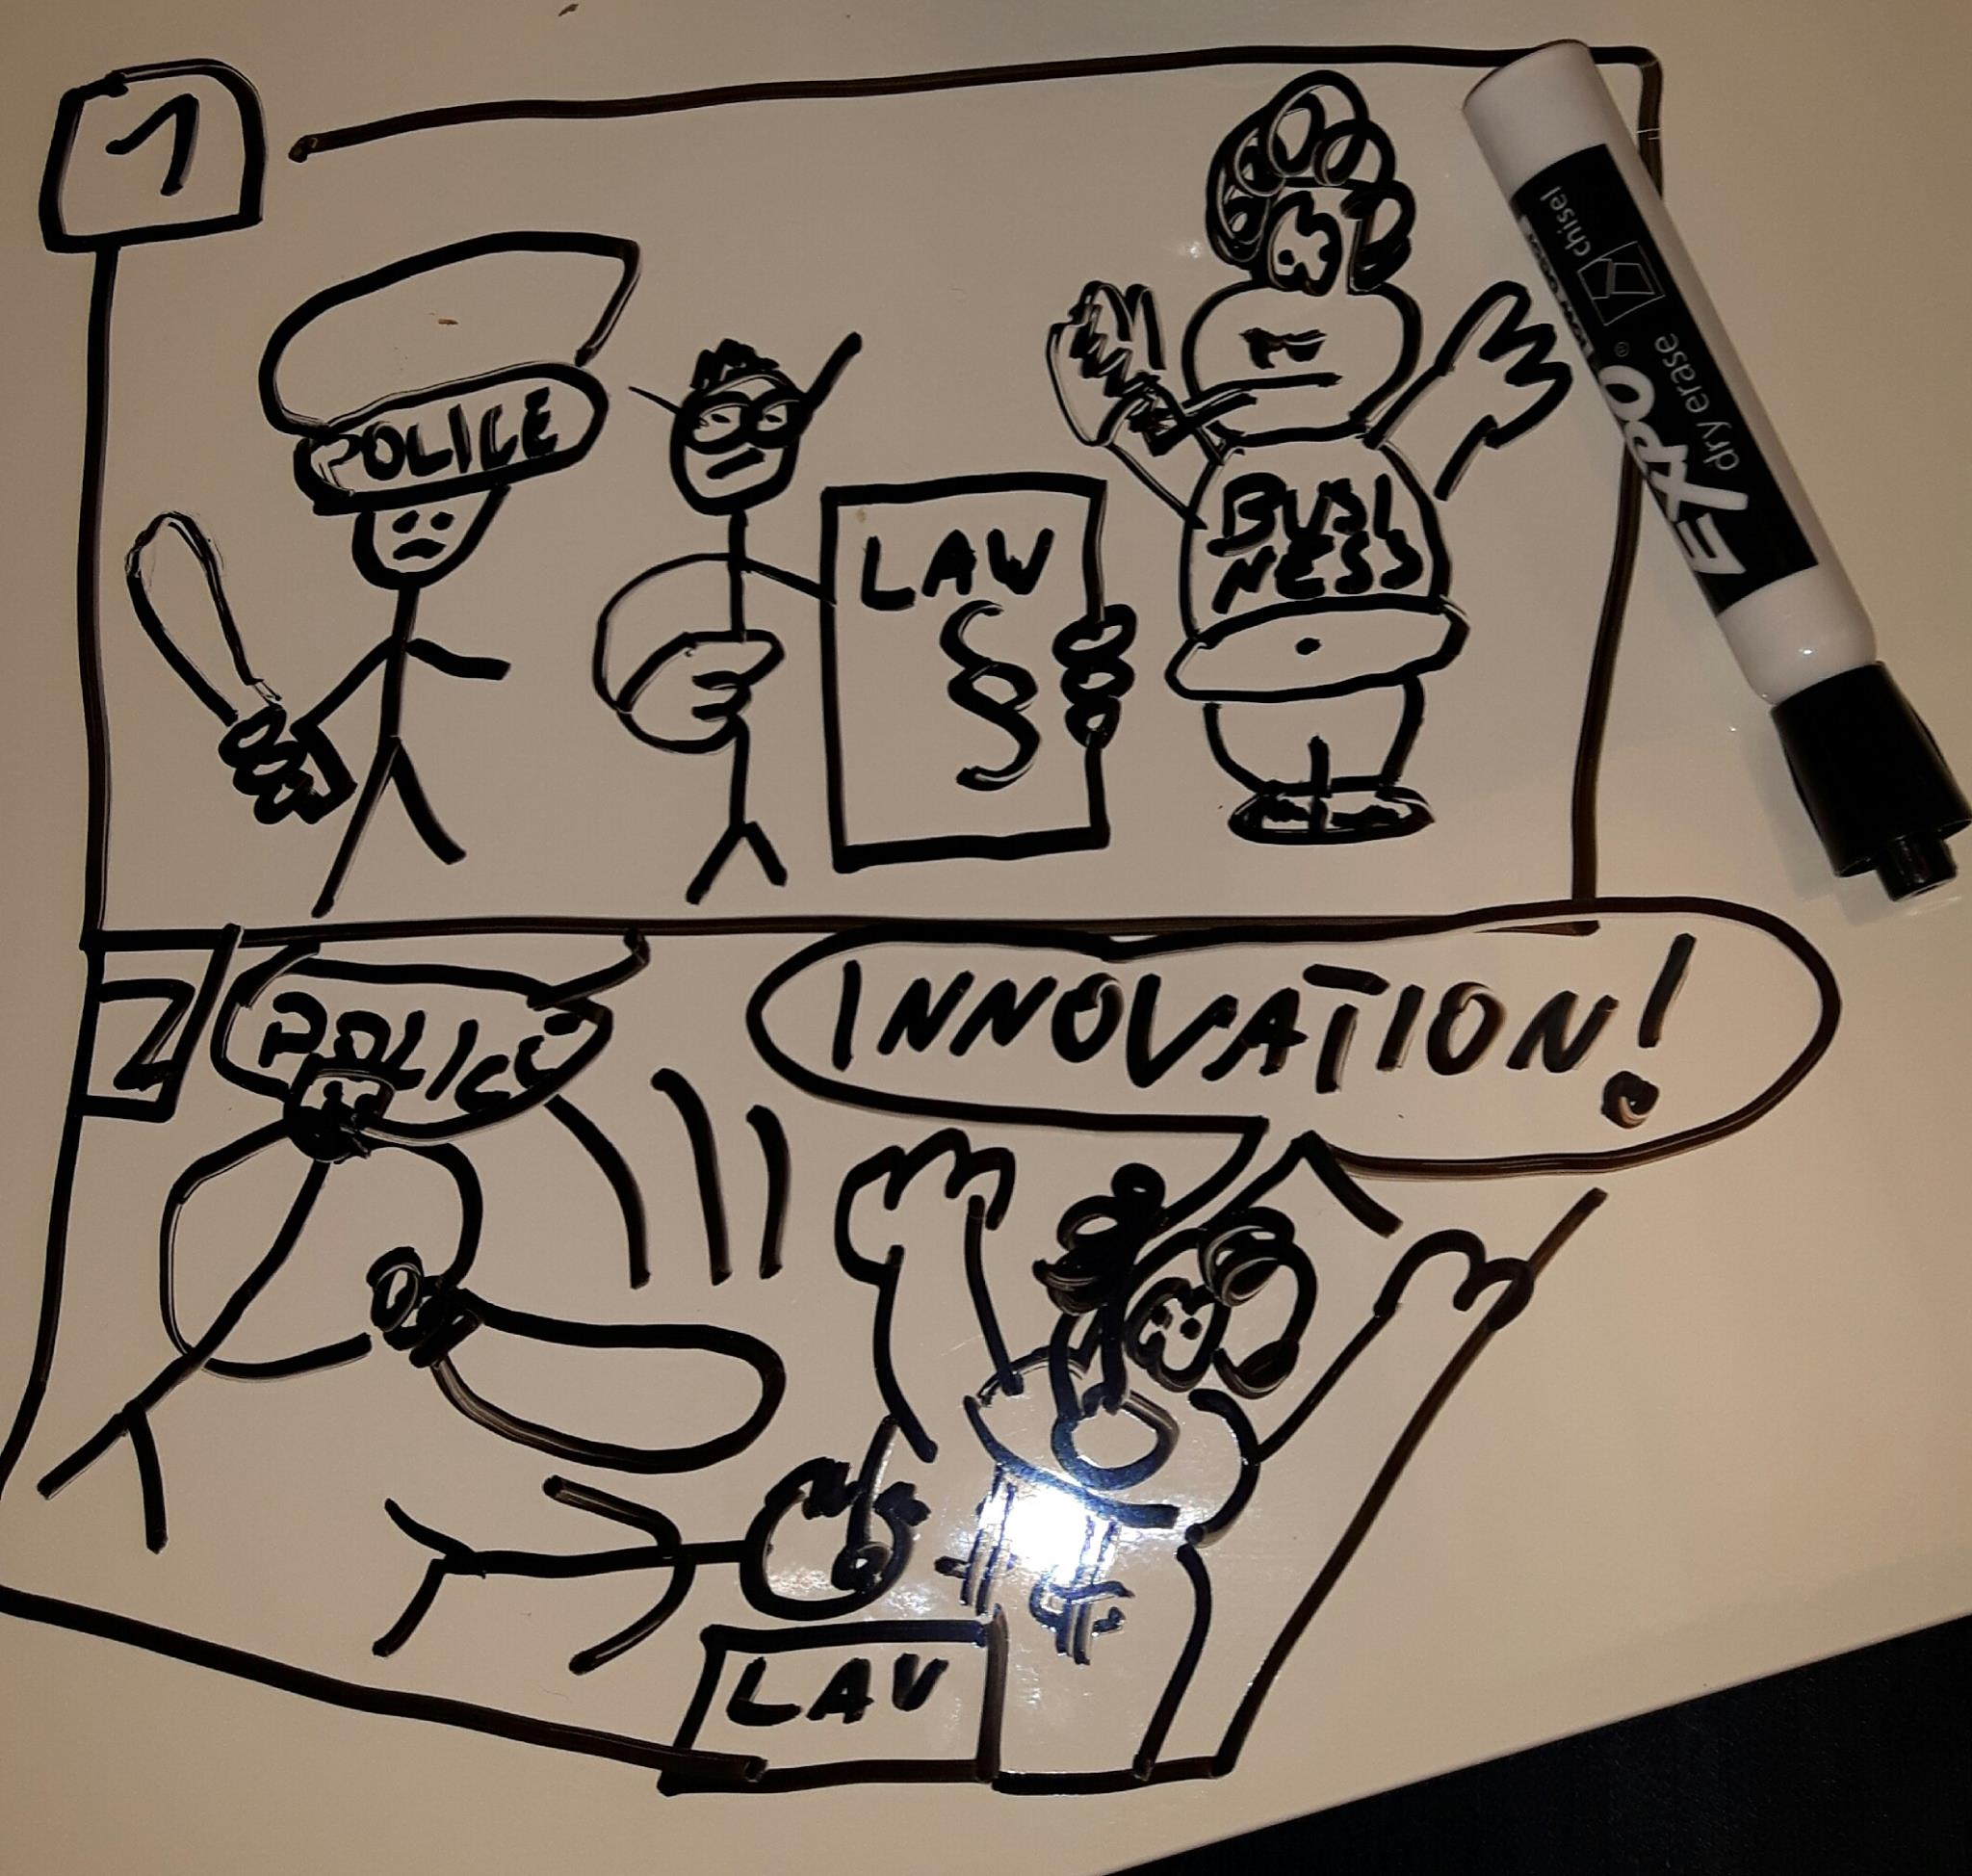 innovationx